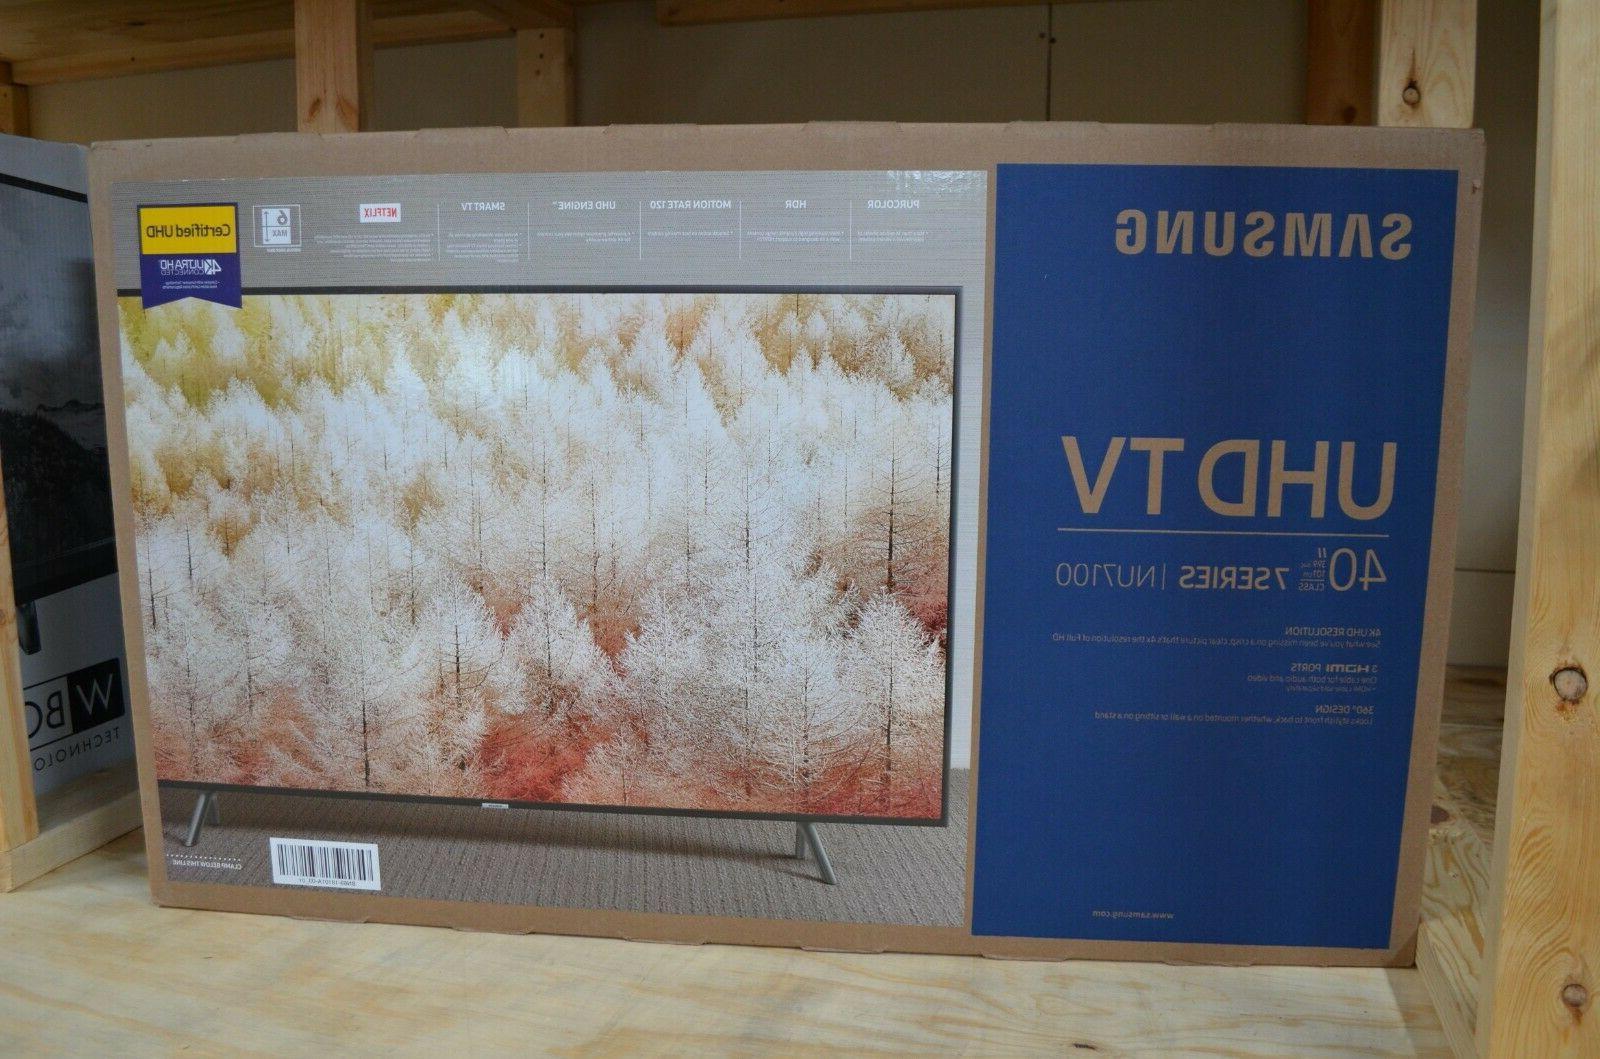 7 series 40 4k uhd smart tv